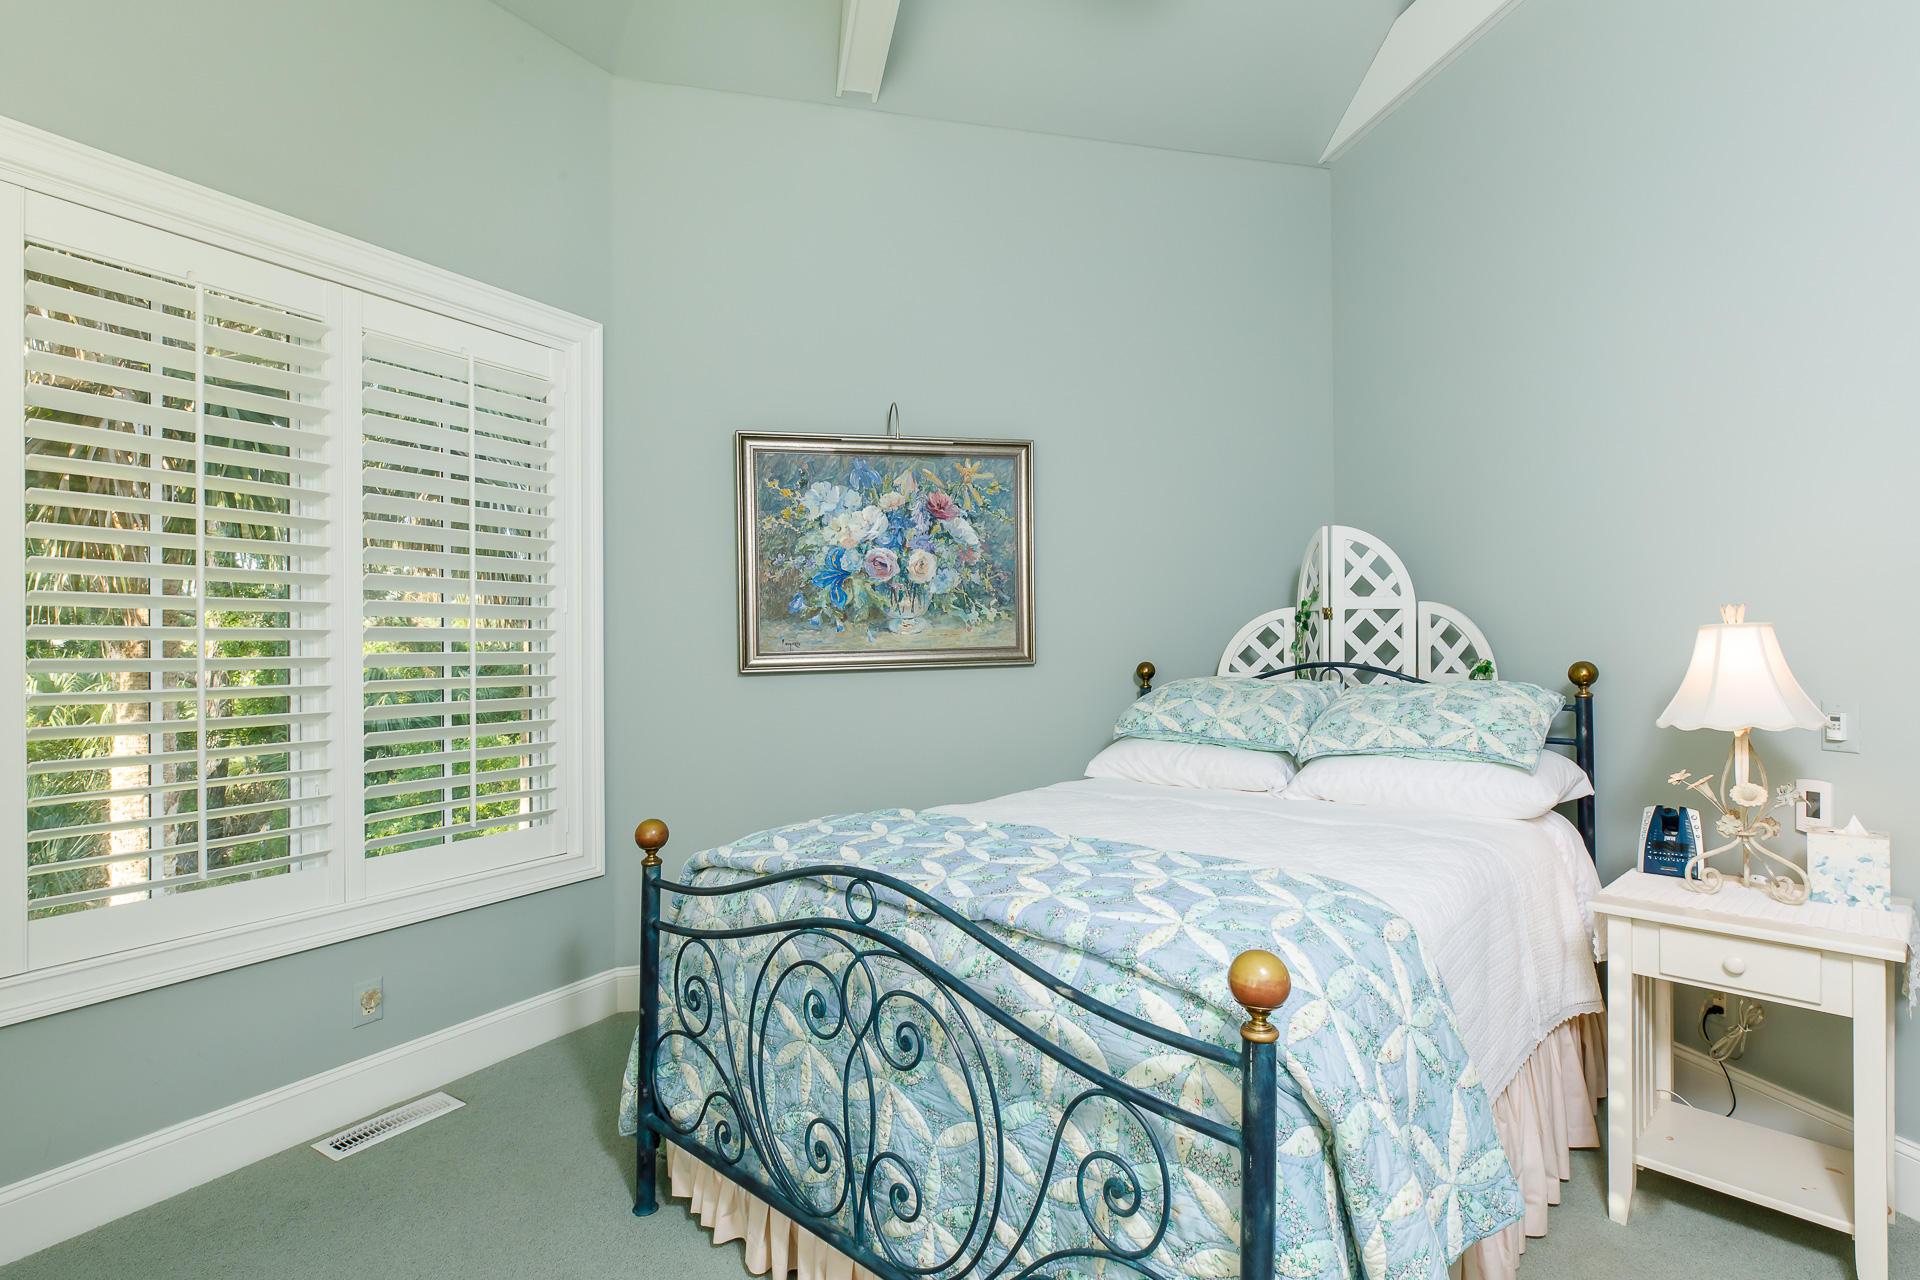 Seabrook Island Homes For Sale - 2216 Rolling Dune, Seabrook Island, SC - 34